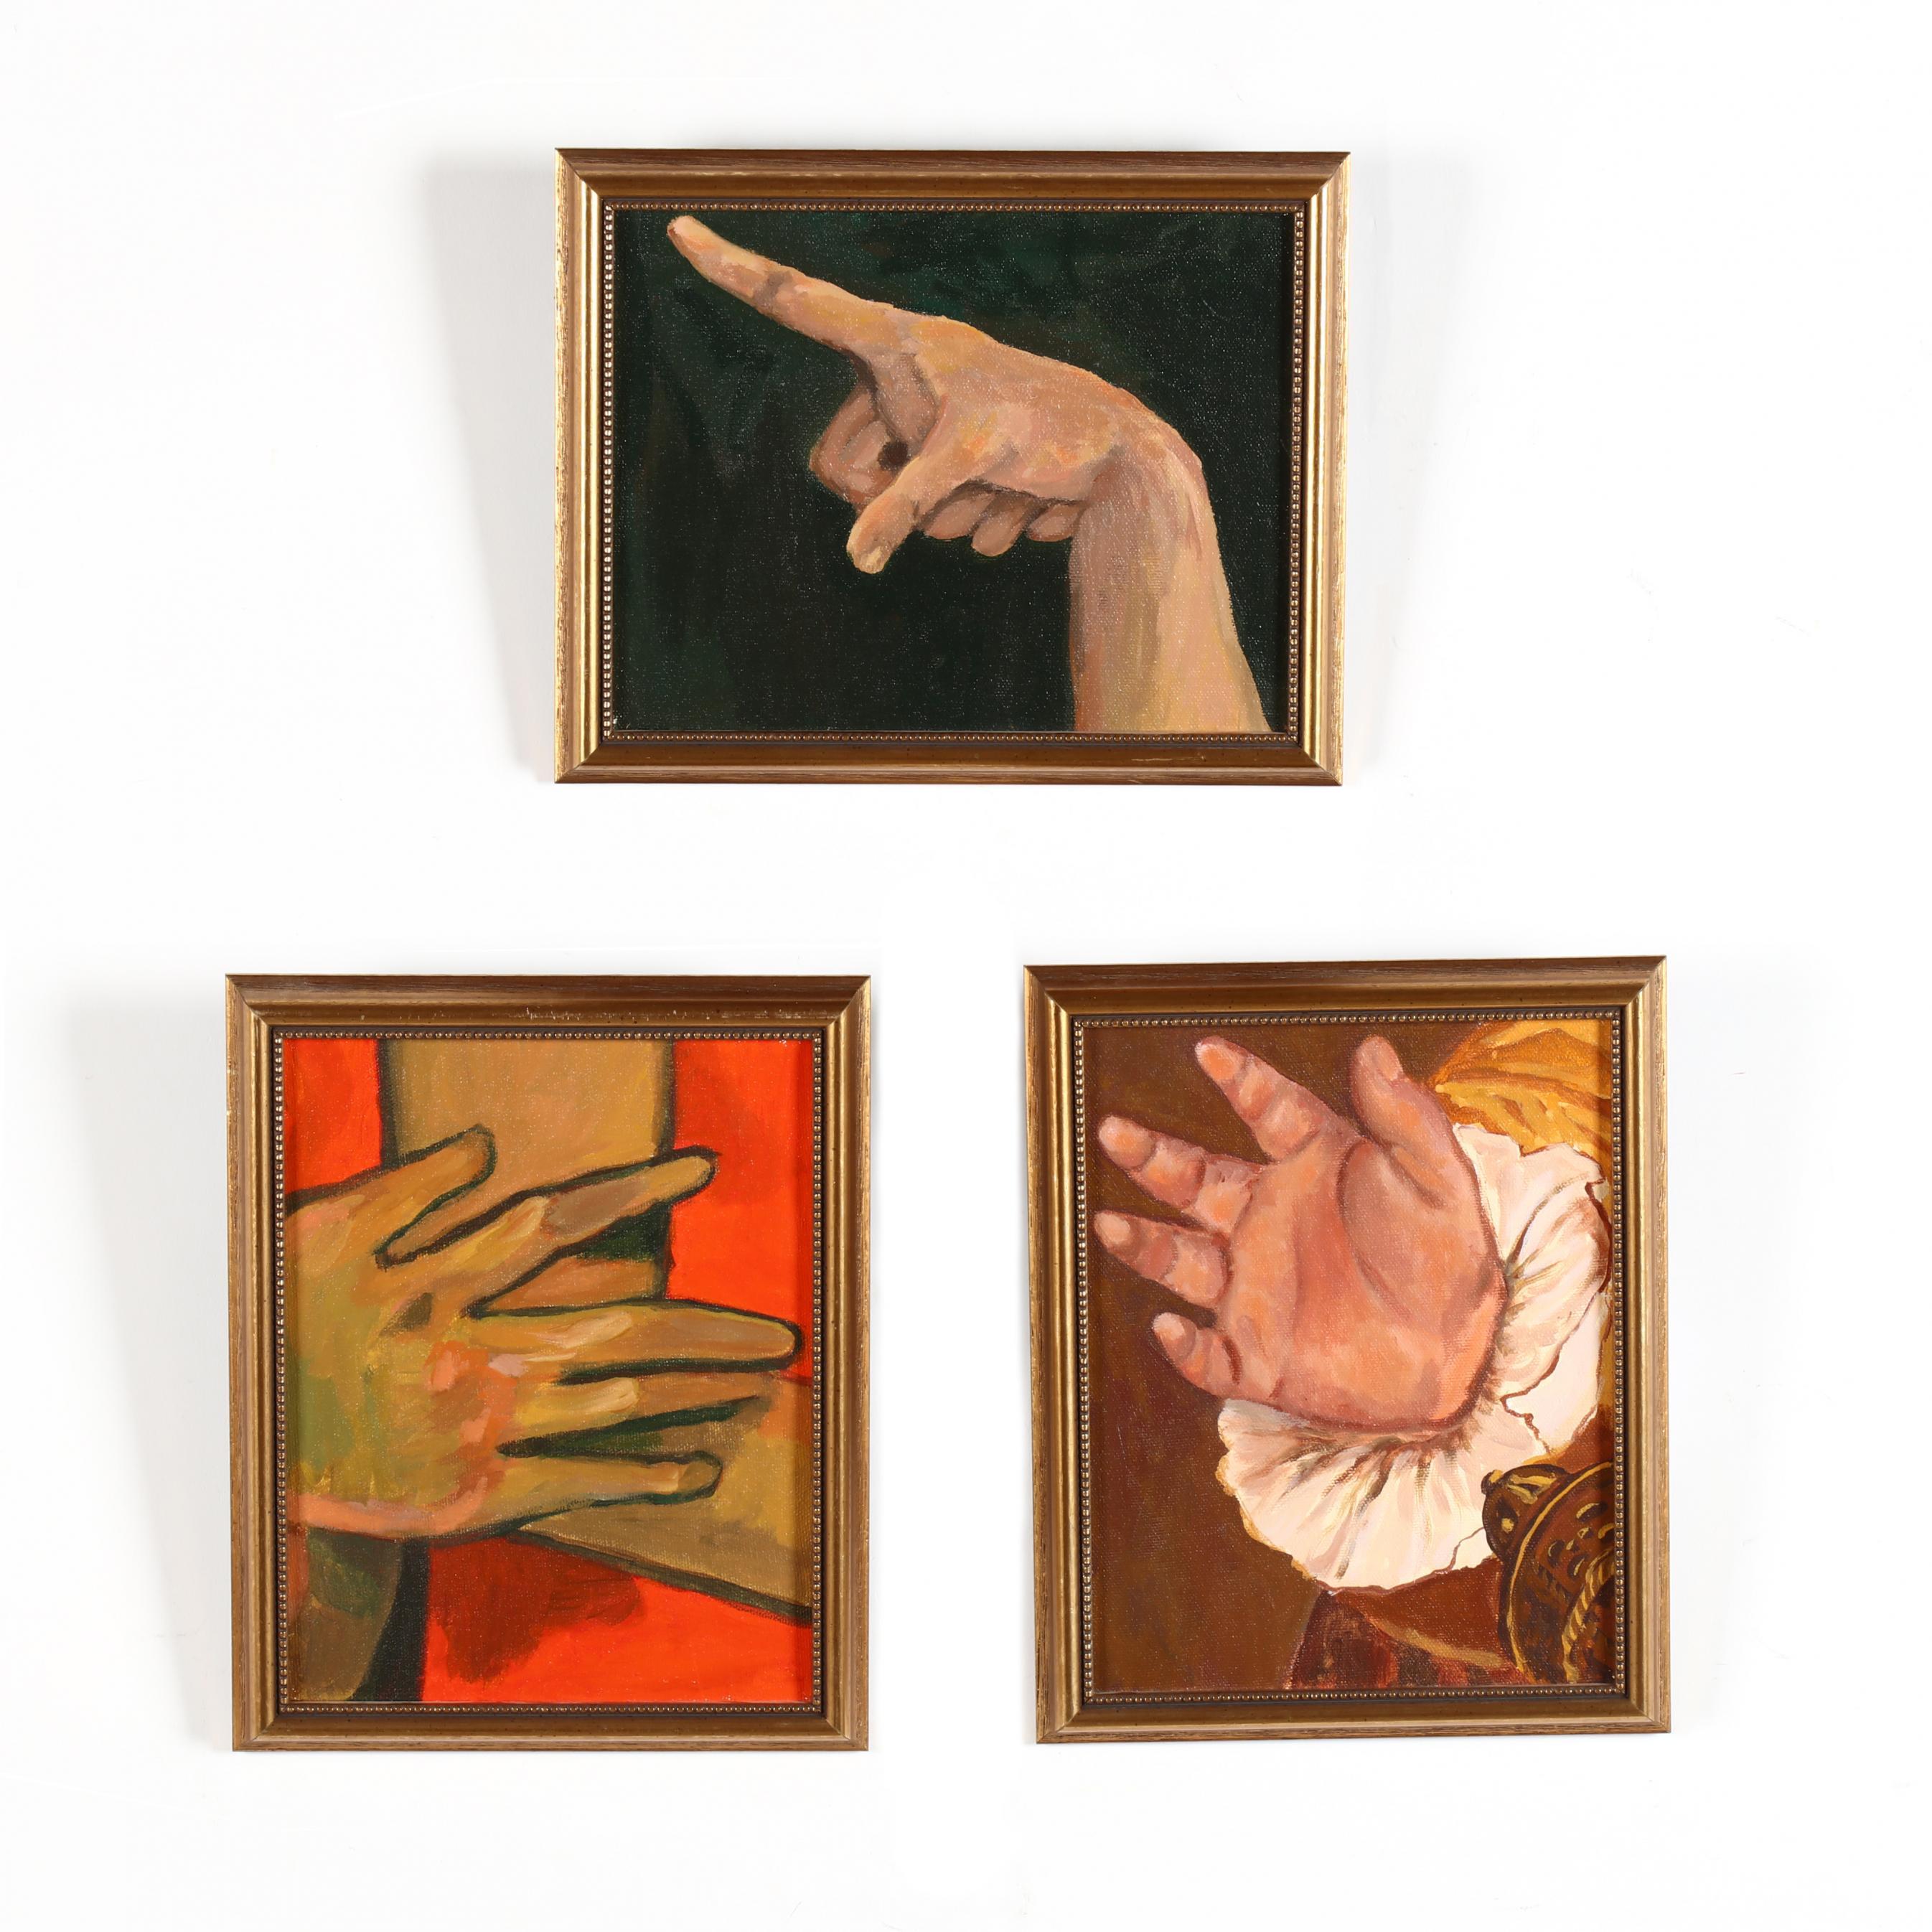 lea-lackey-zachman-nc-three-studies-of-hands